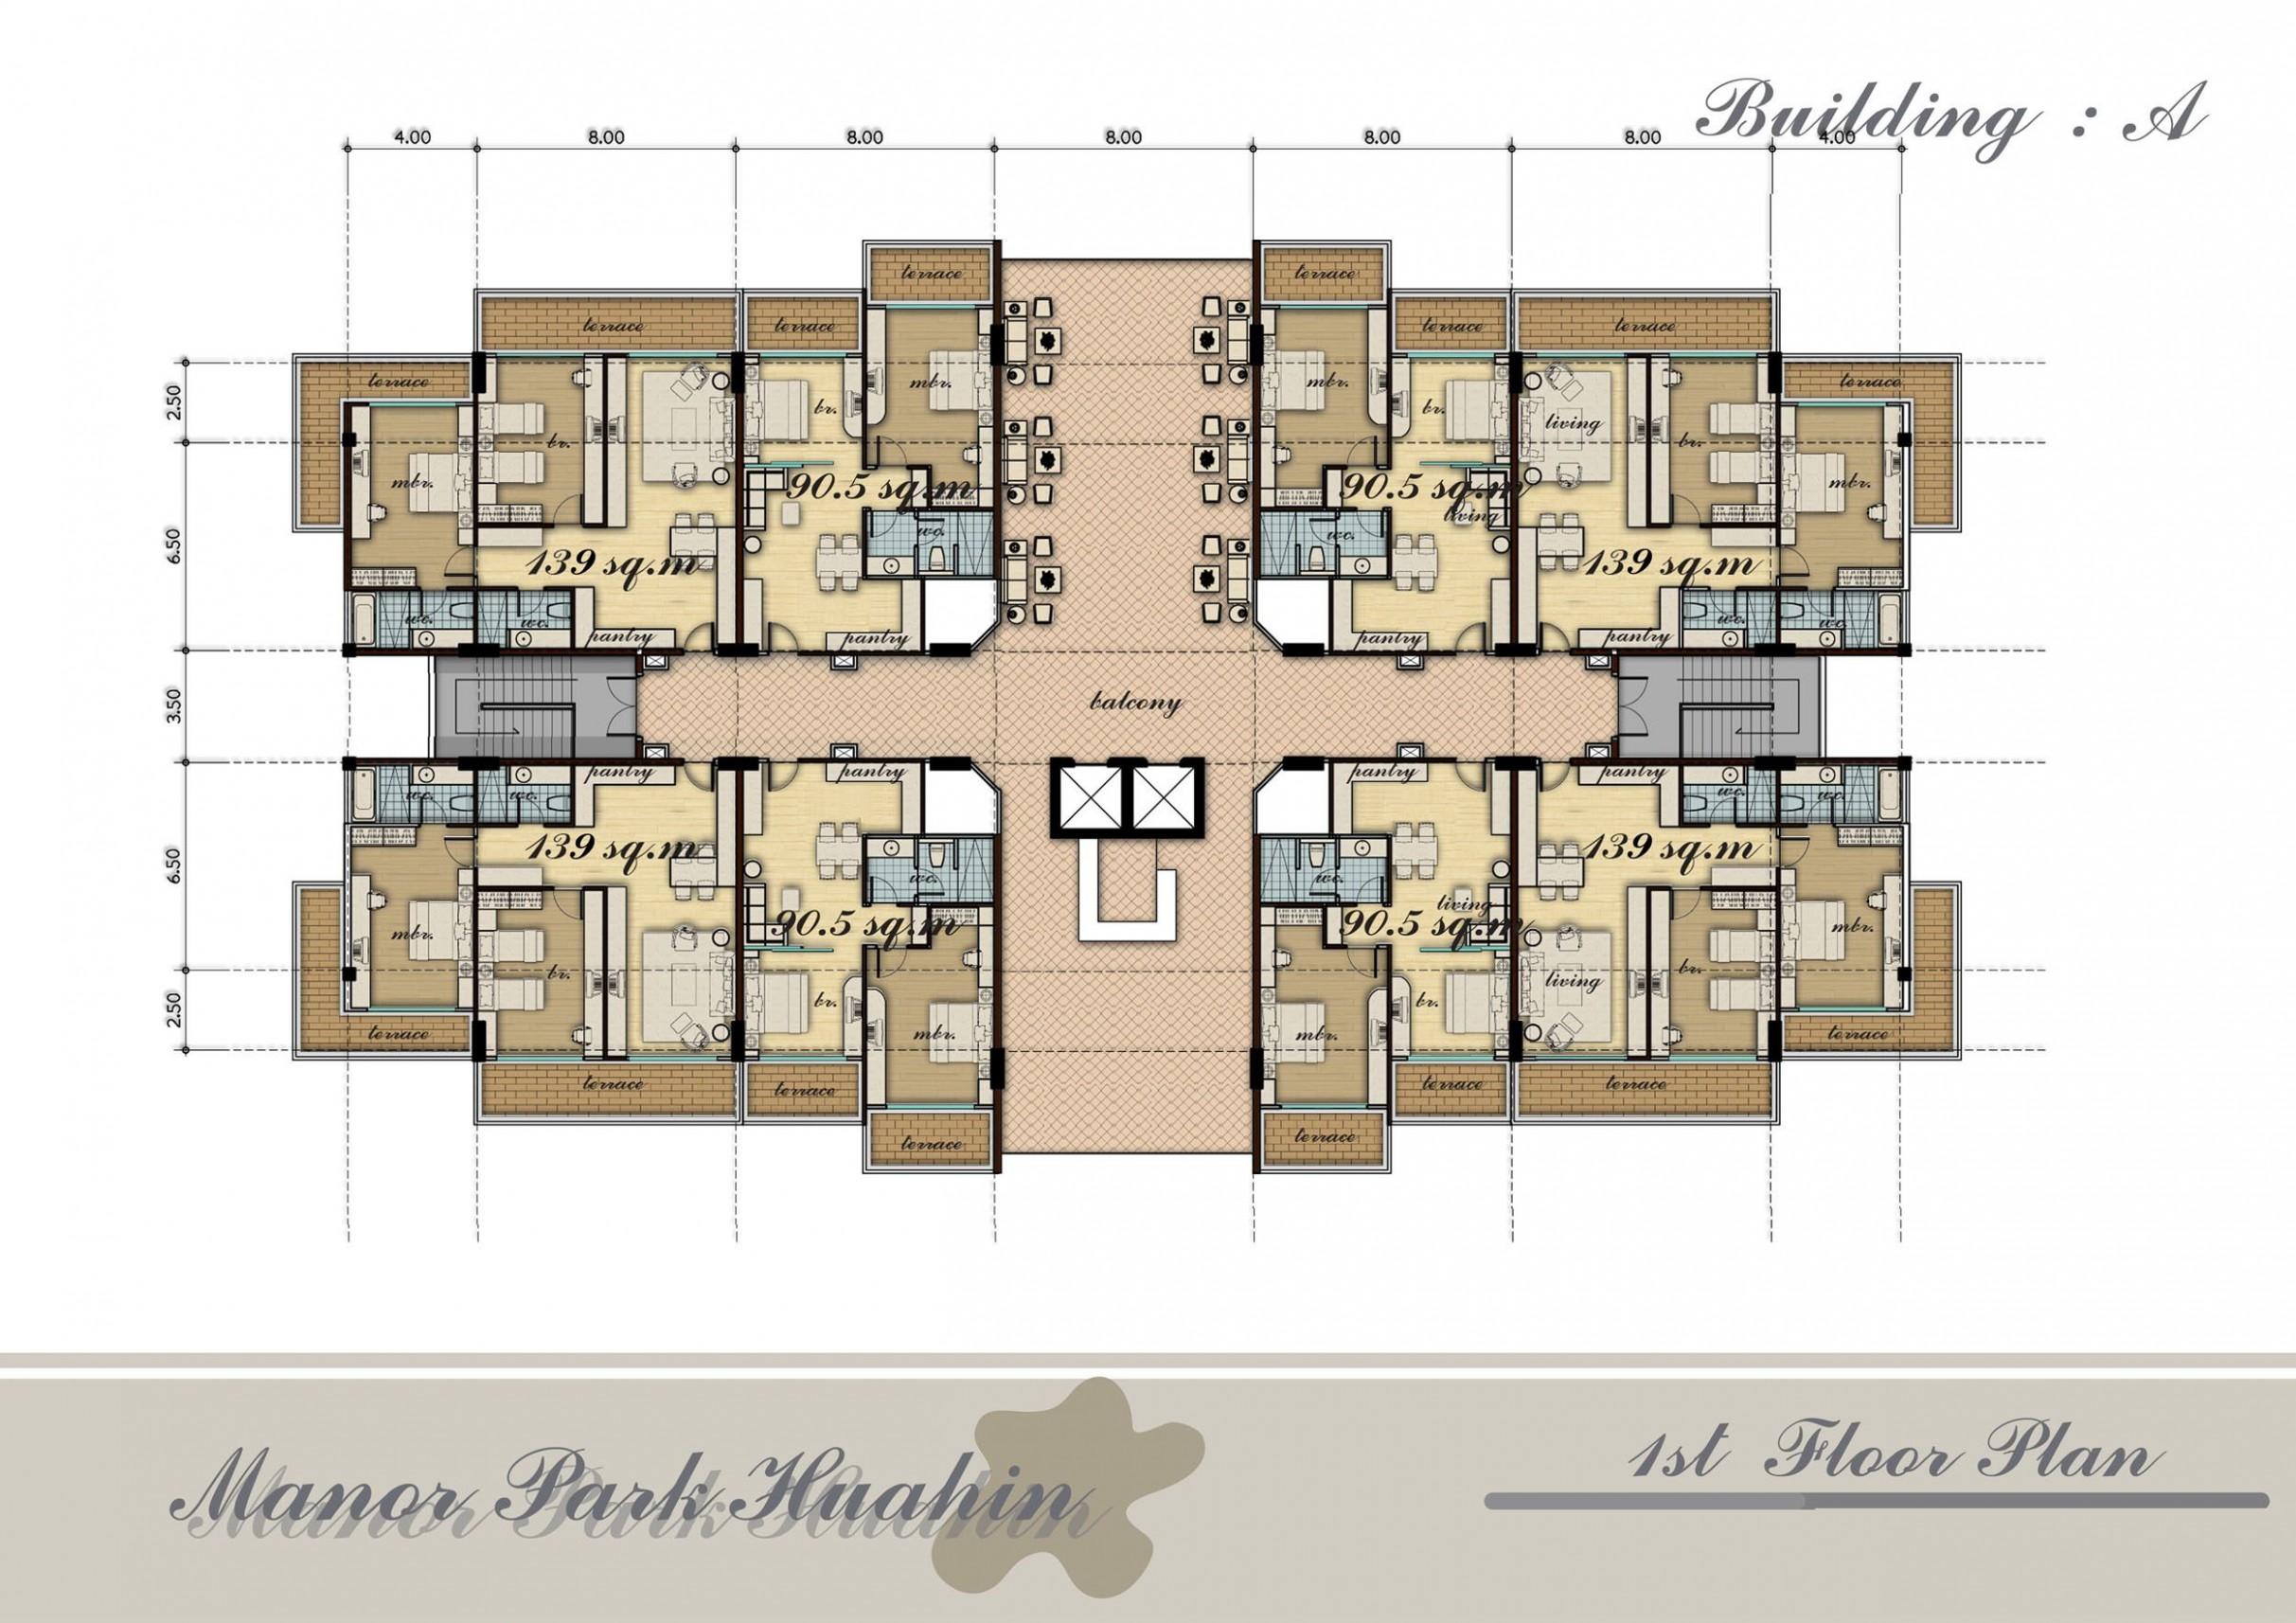 Apartment Building Floor Plans Amusing Painting Lighting Fresh In  - Apartment Architecture Design Plans